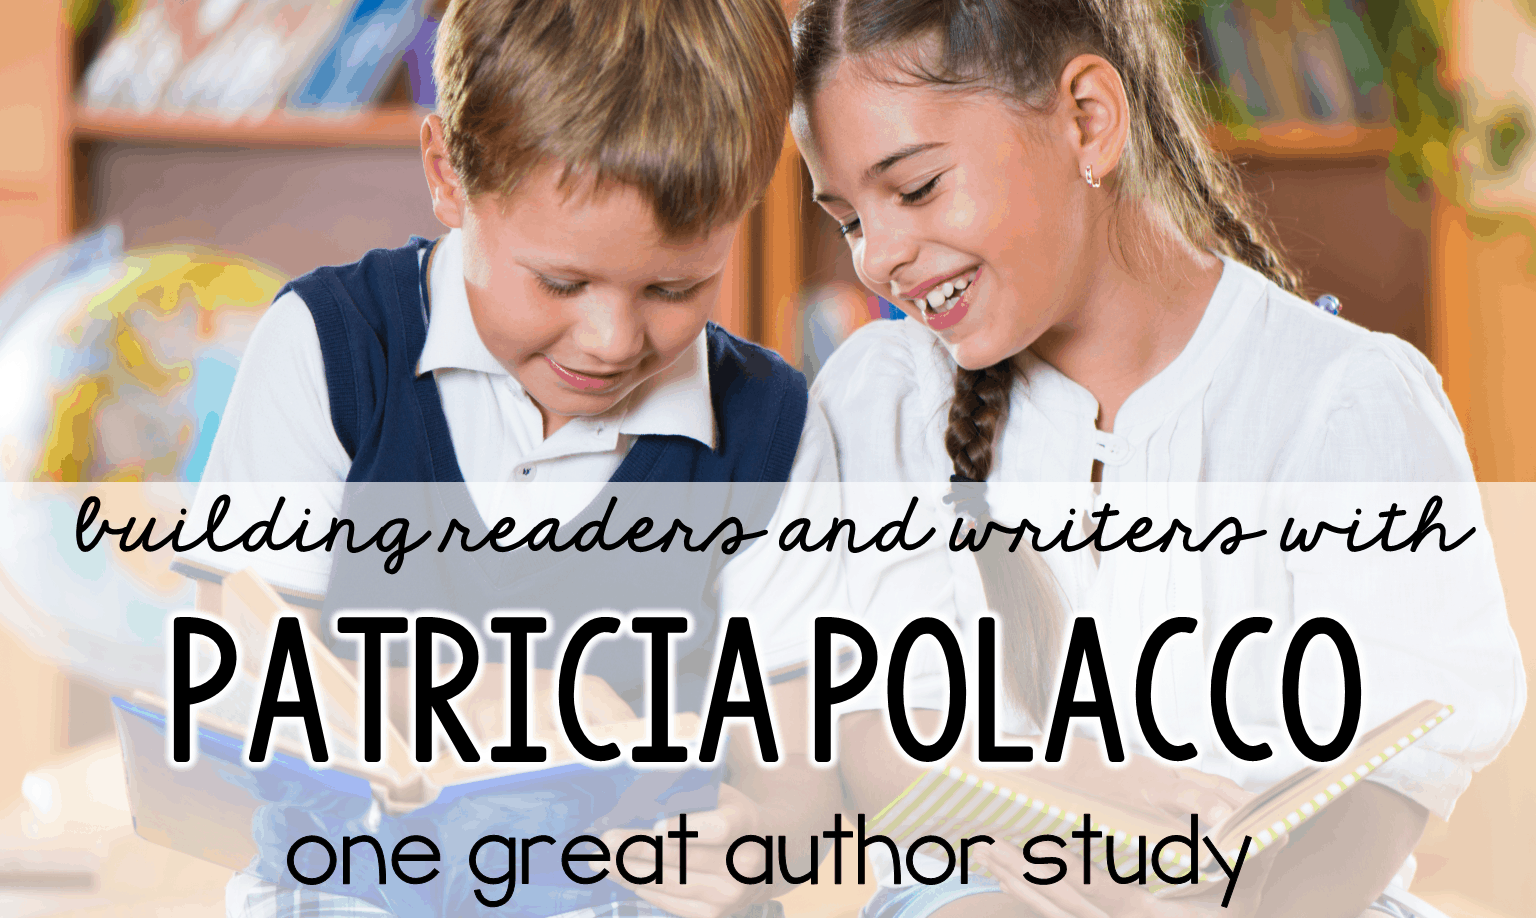 patricia2bpolacco2bblog2bpost-5323079